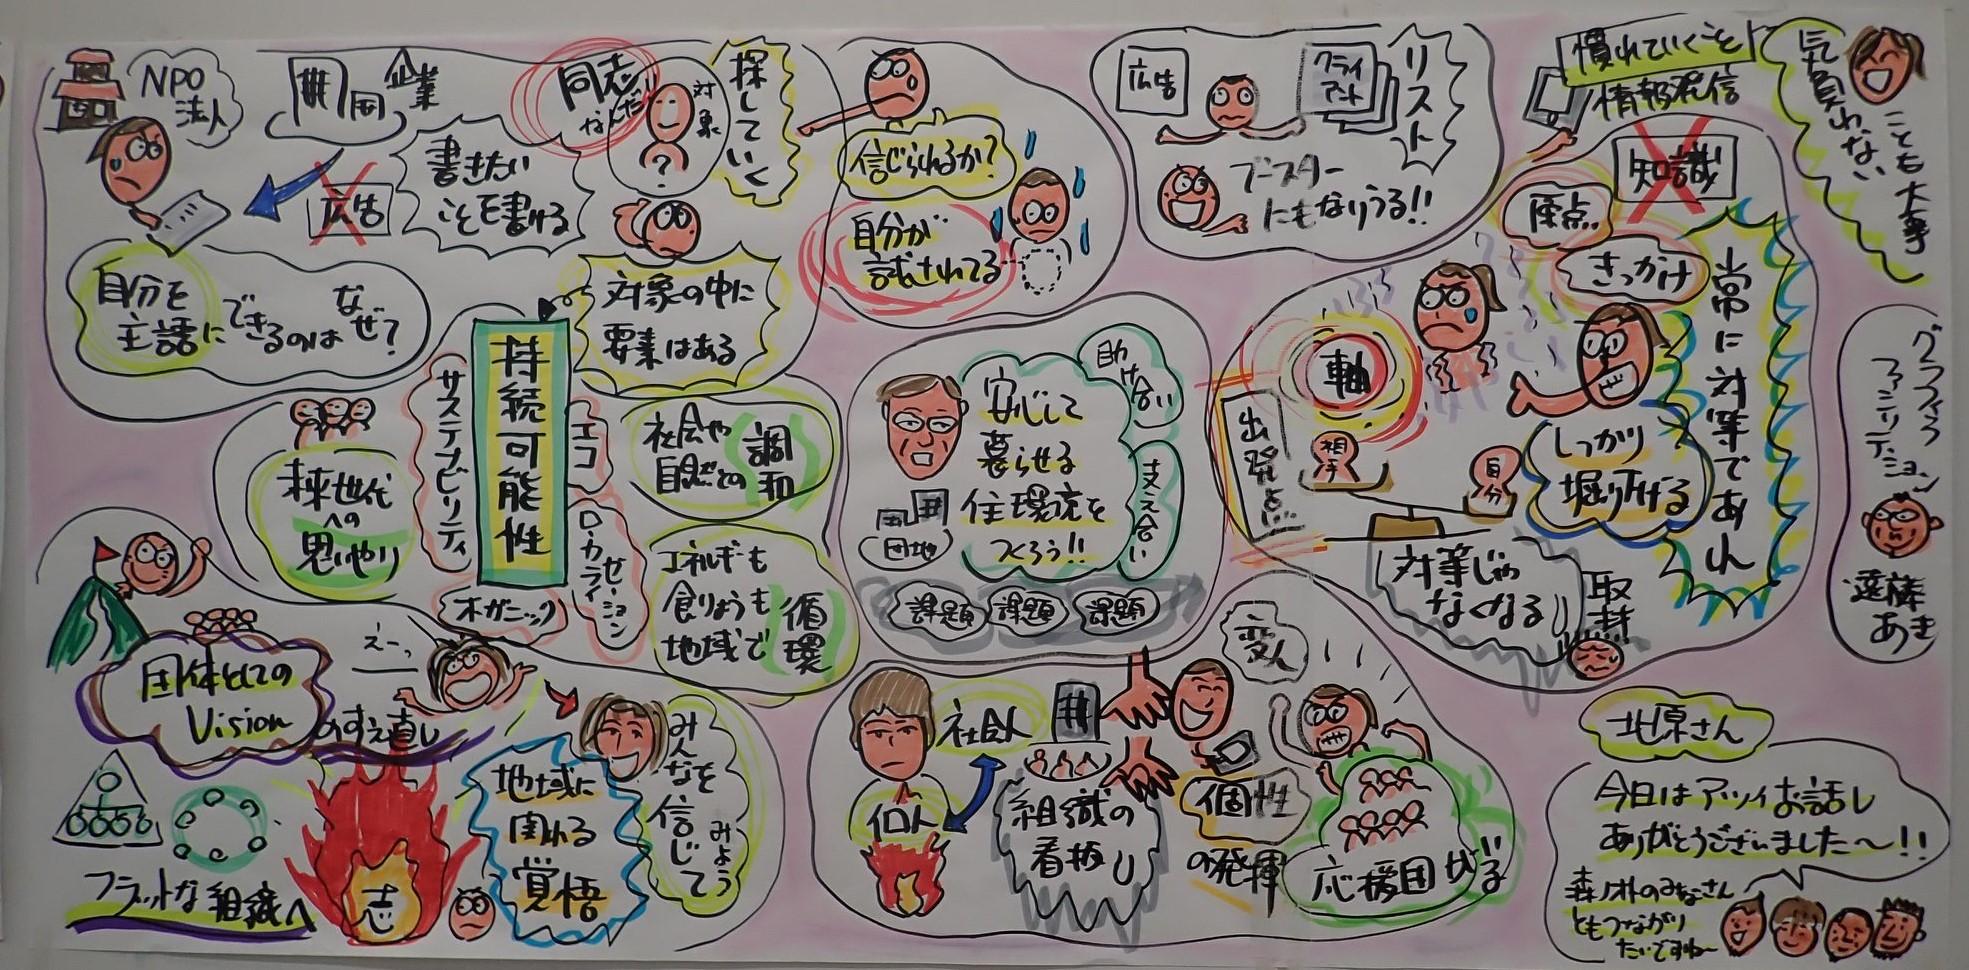 https://tamaempower.co.jp/project/files/fasigura2.jpg